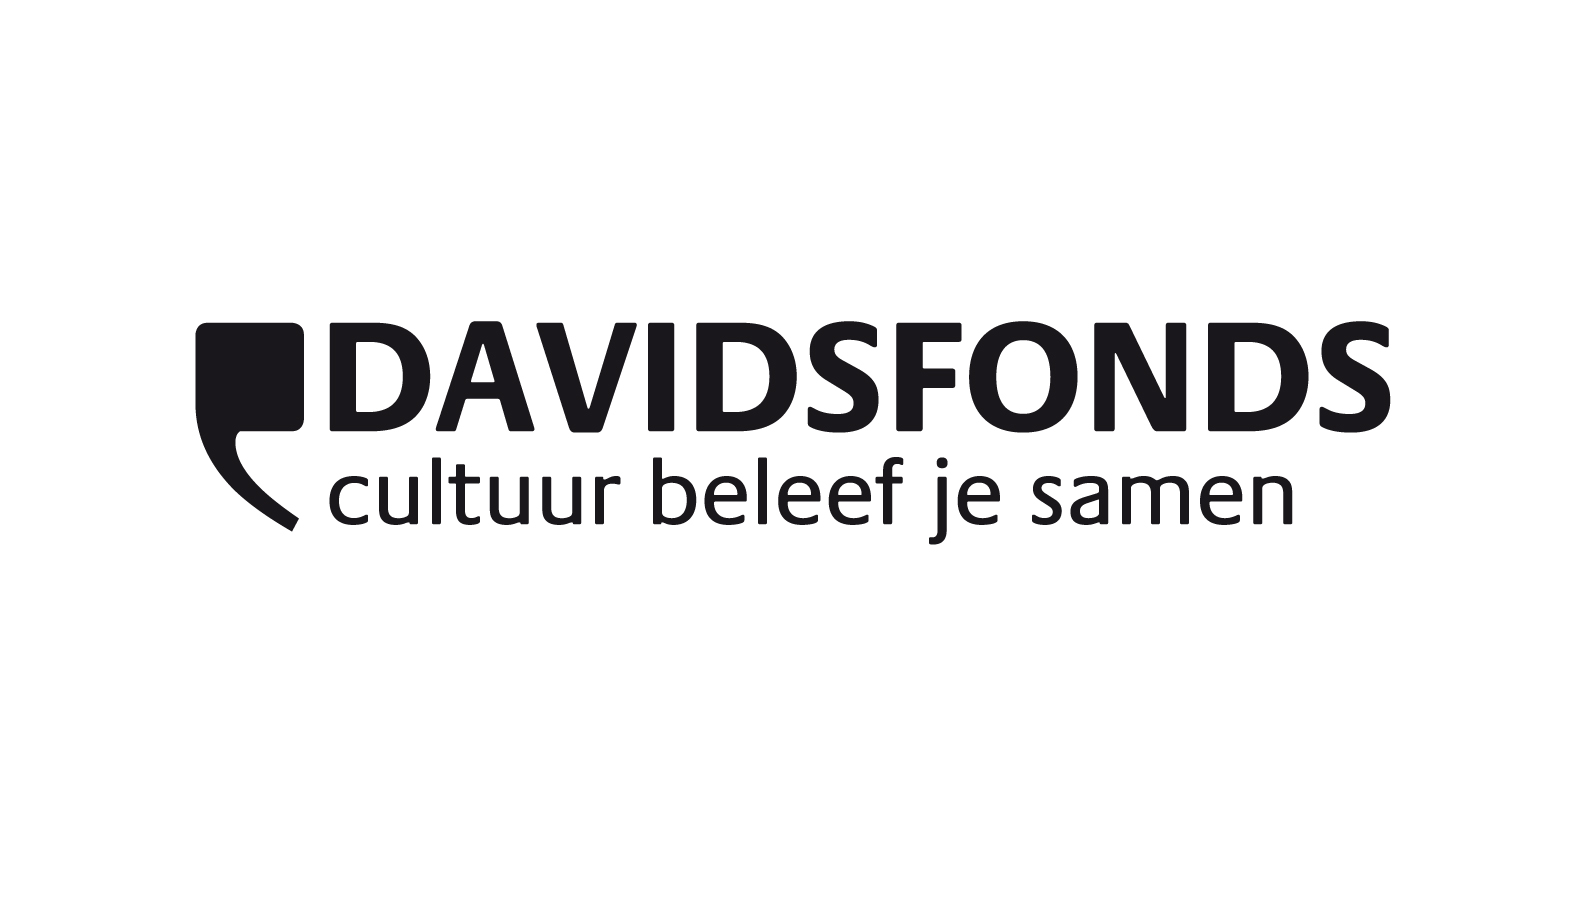 Davidsfonds Bazel